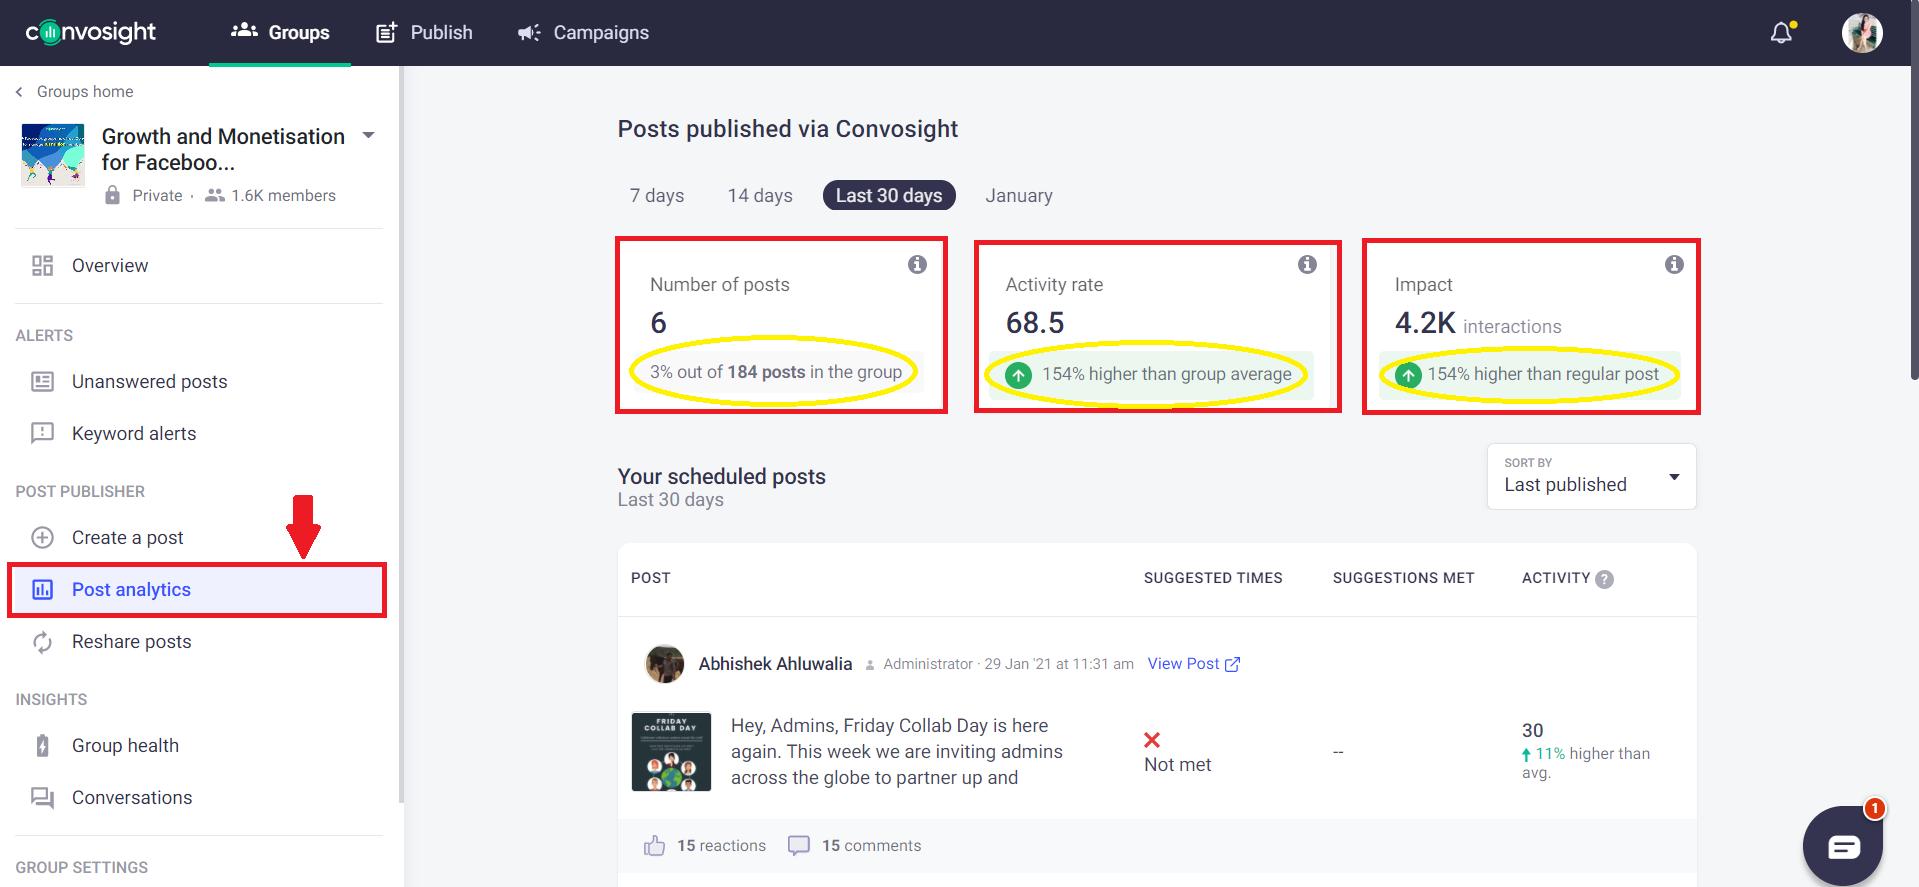 post analytics feature of convosight